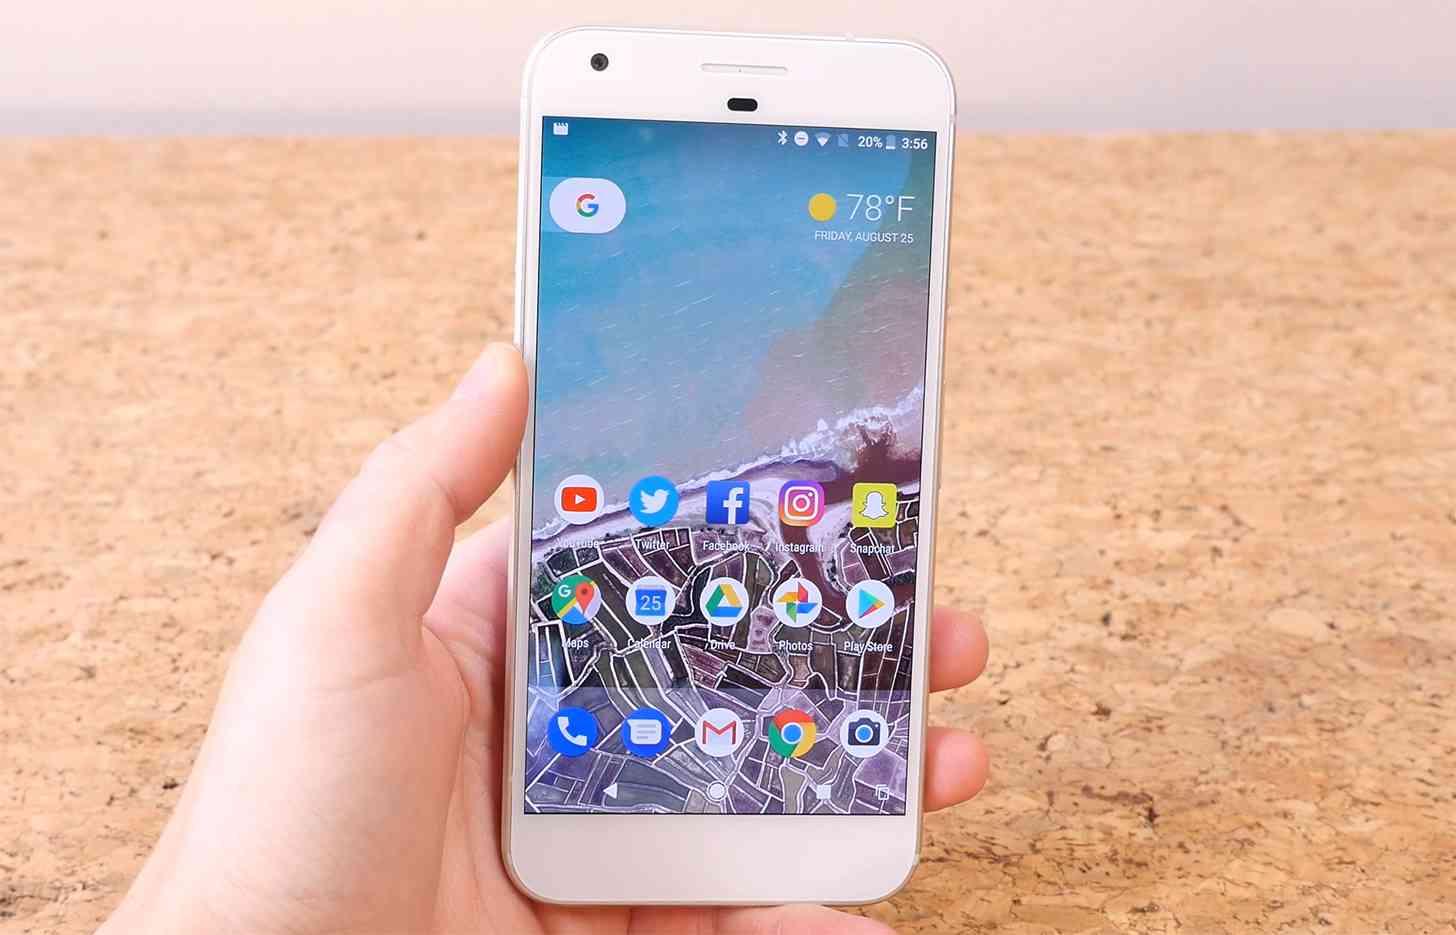 Google Pixel XL hands-on review